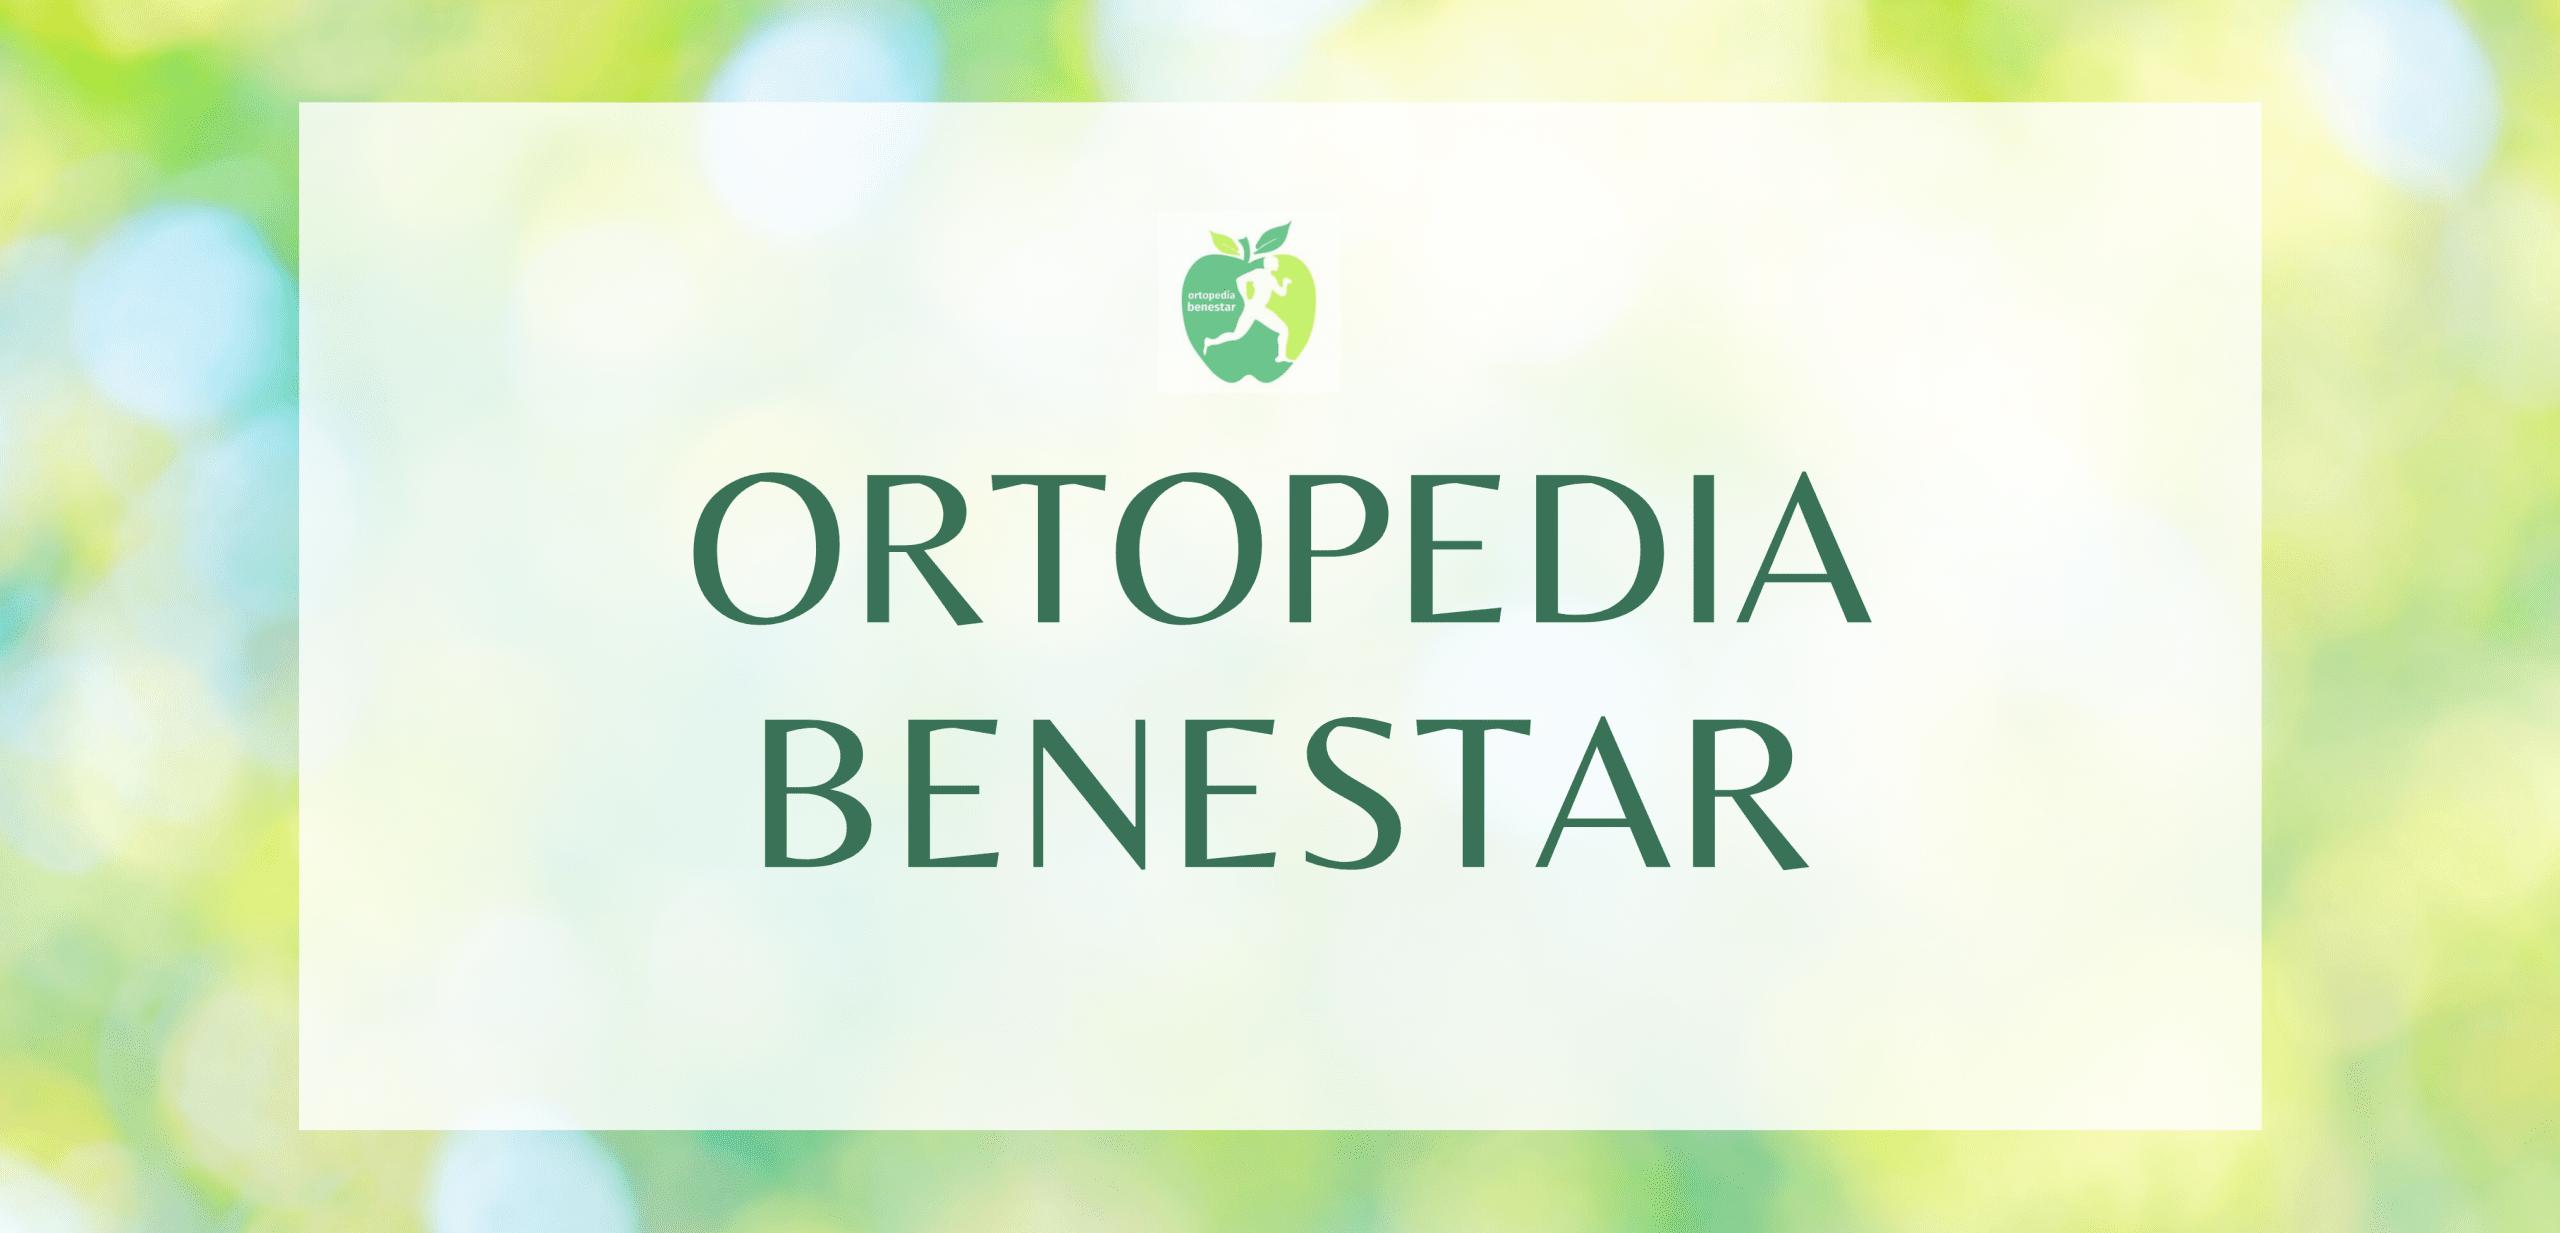 Ortopedia Benestar